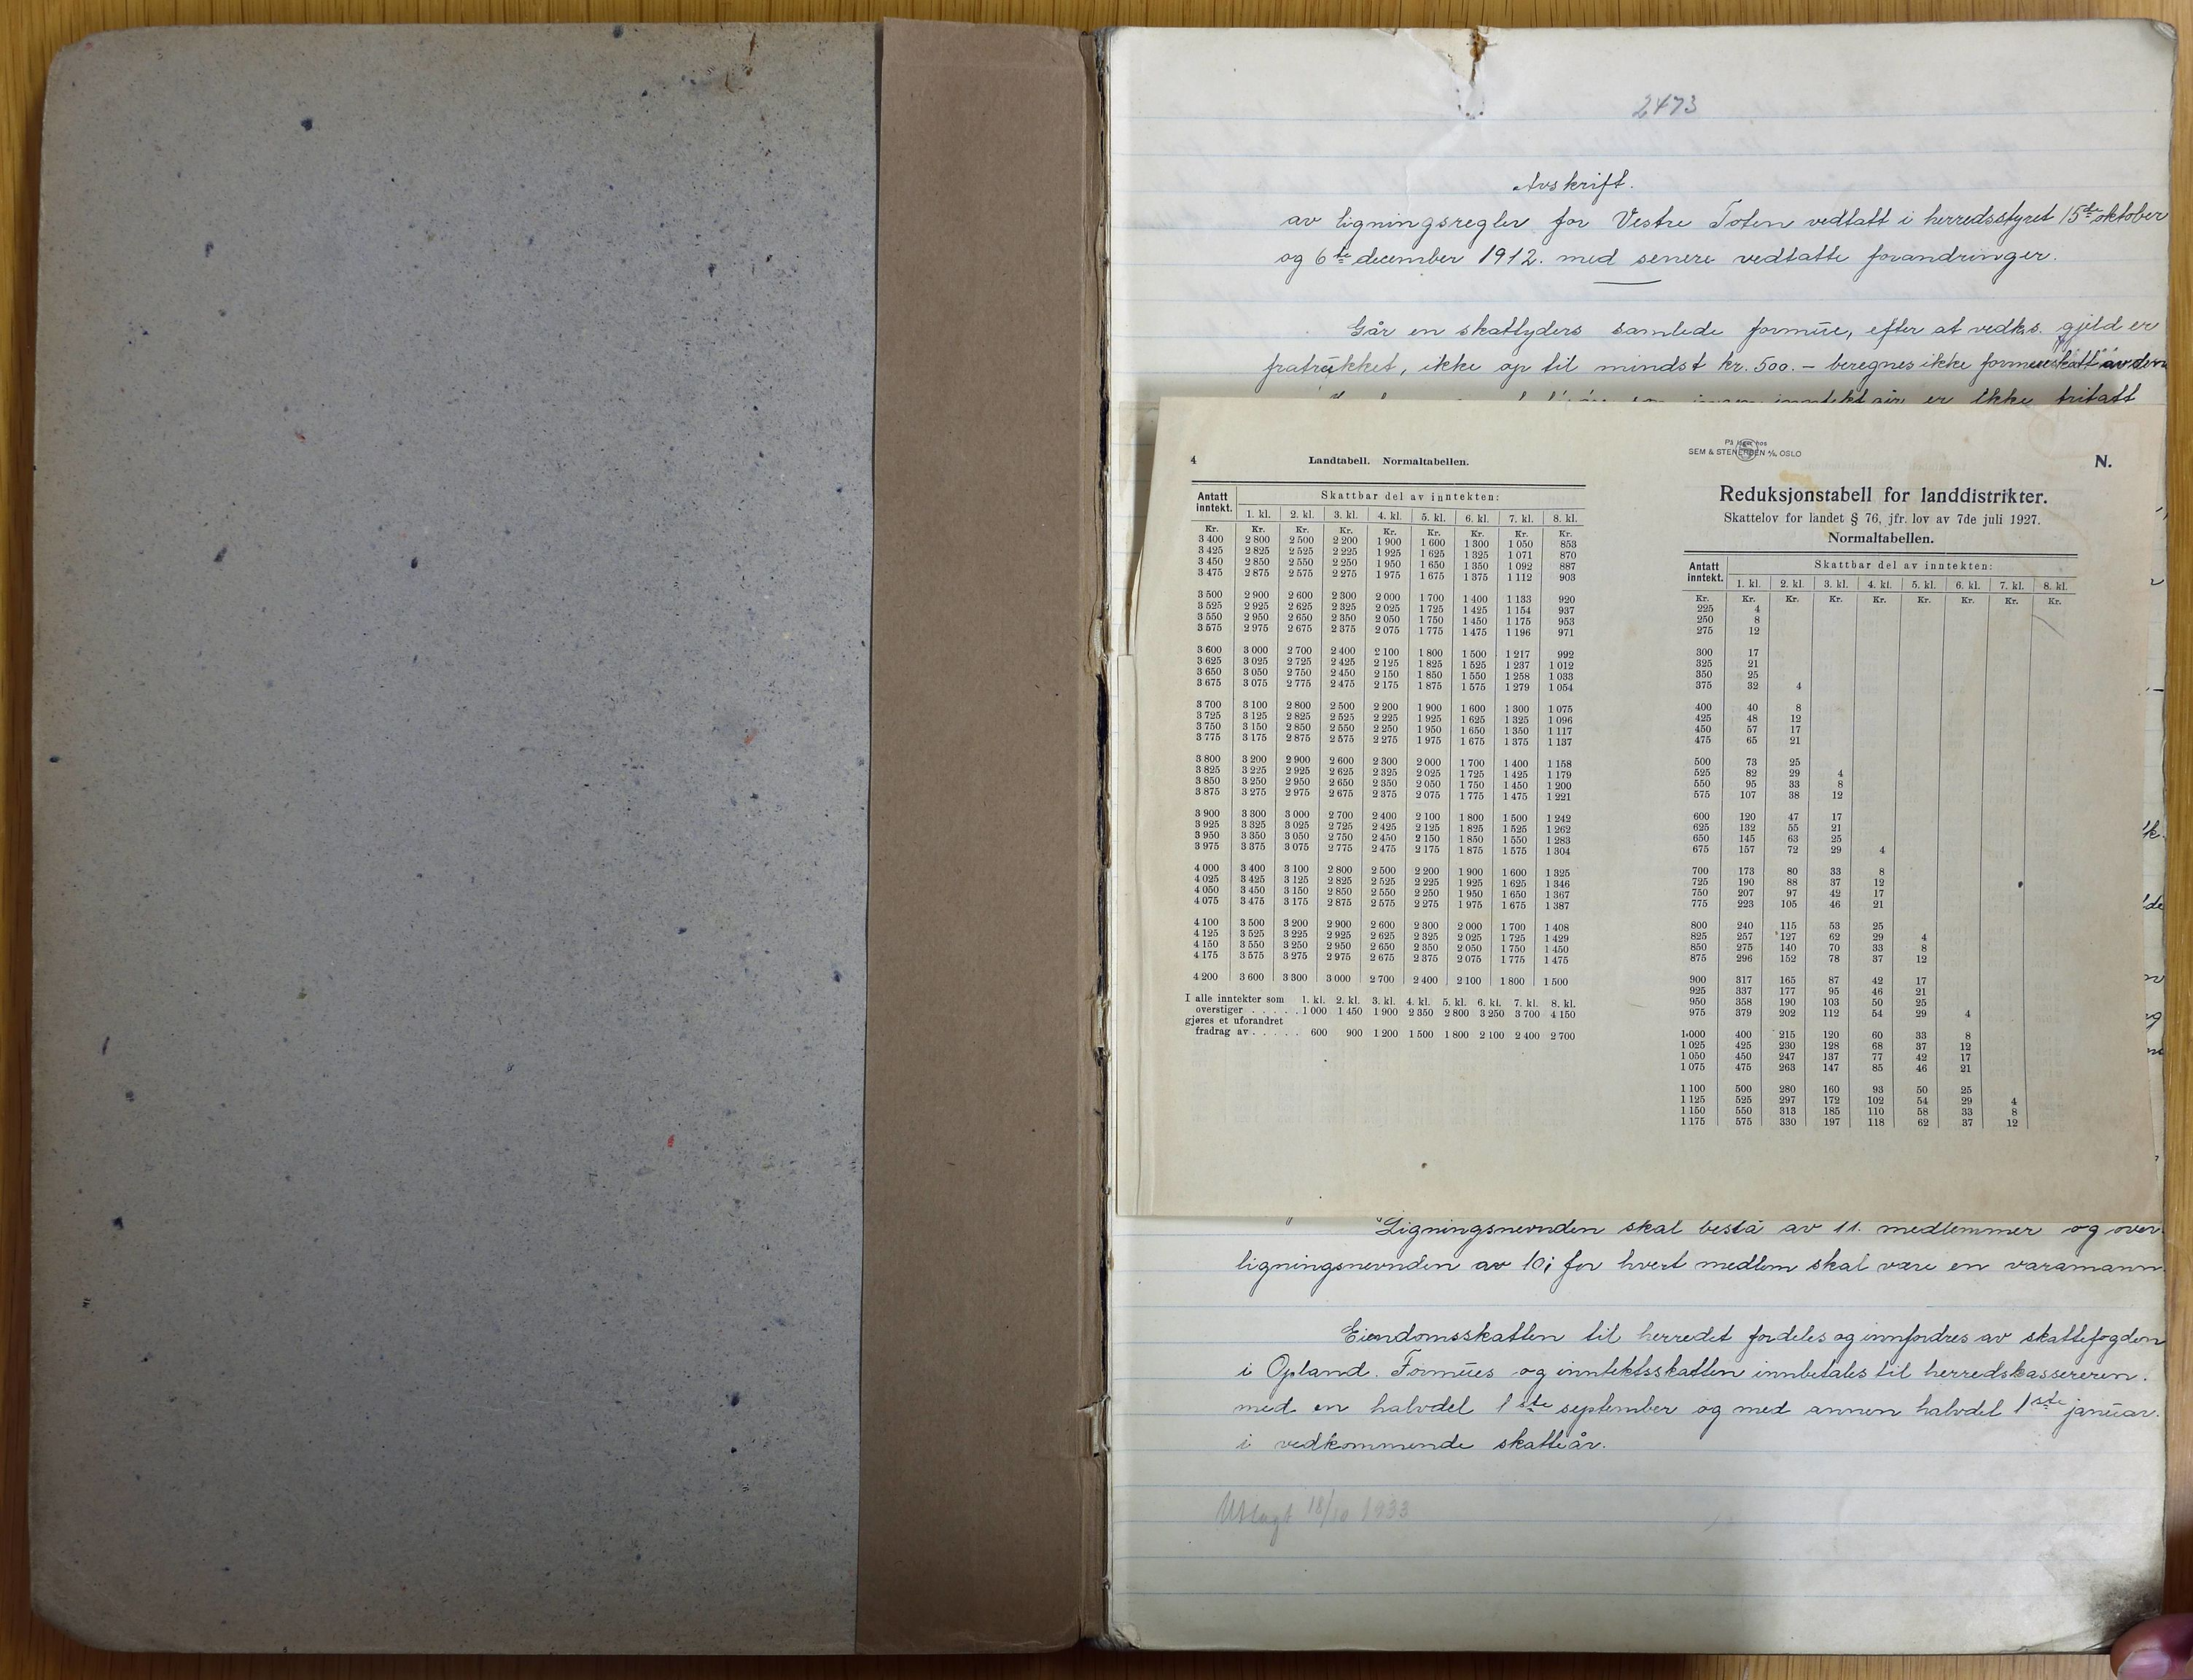 KVT, Vestre Toten kommunearkiv: Avskrift av ligningsprotokollen for budsjettåret 1932-1933 i Vestre Toten skattedistrikt, 1932-1933